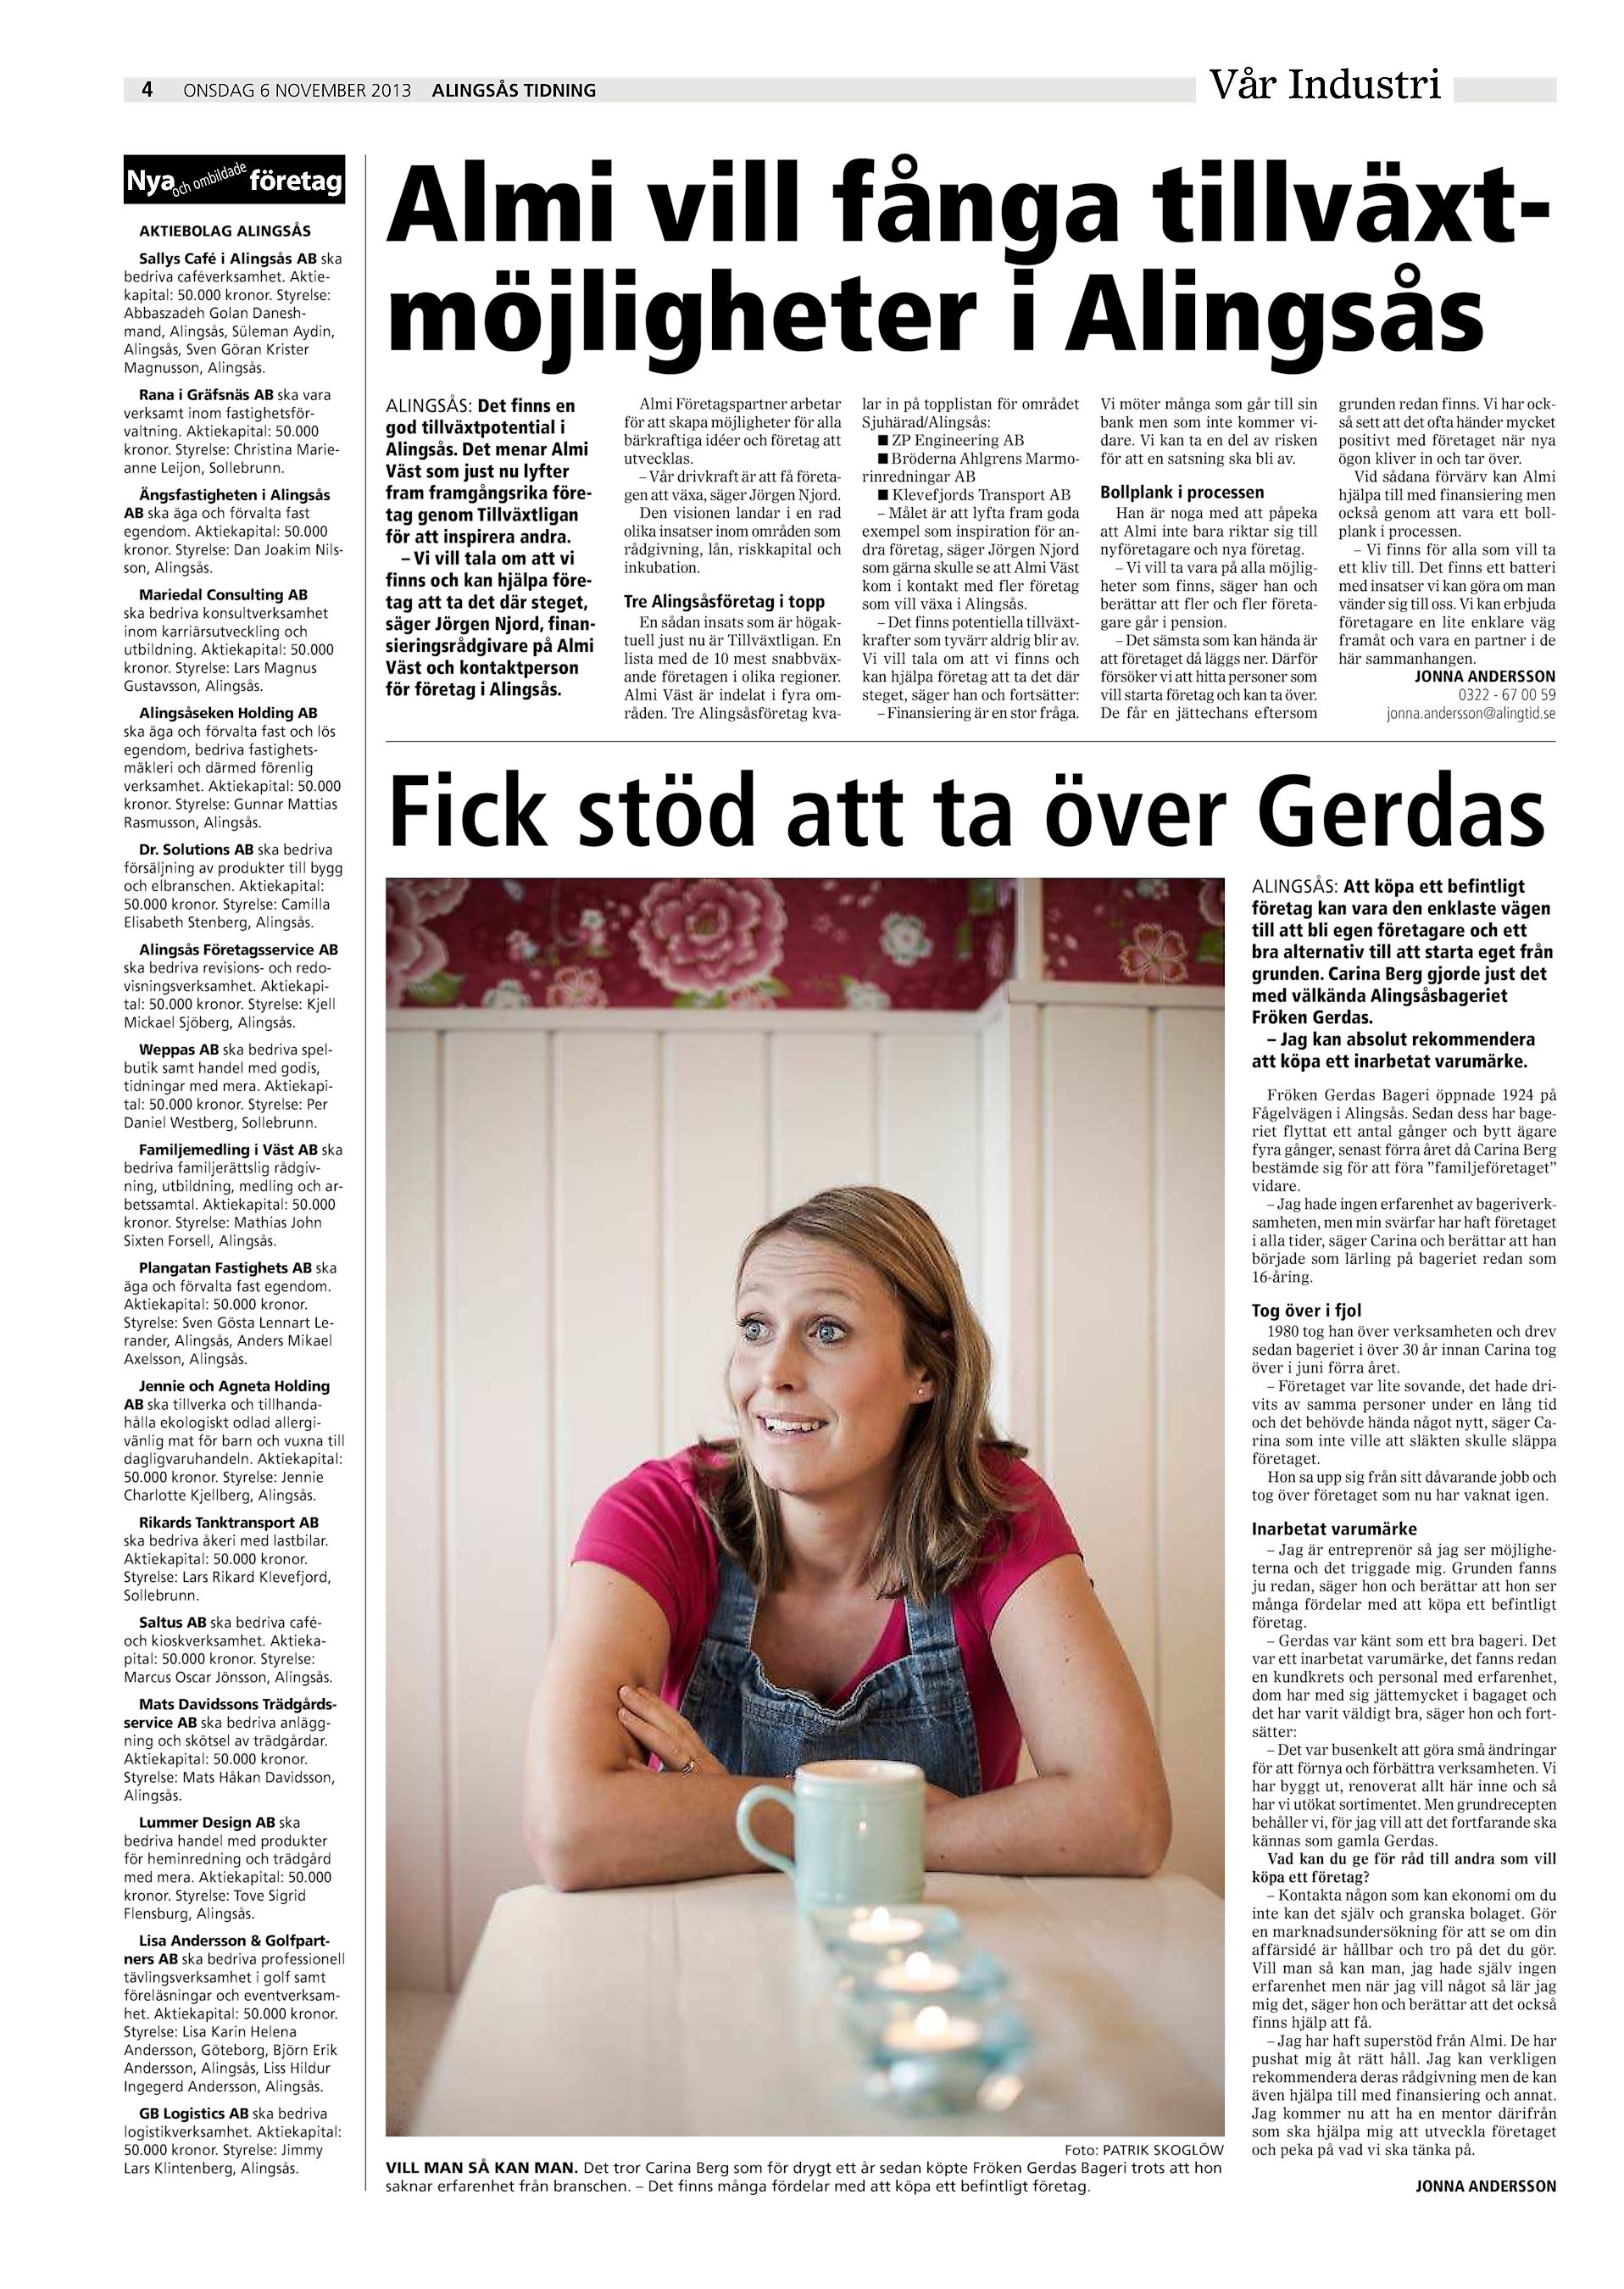 Alla kategorier Sverige Vstra Gtalands ln